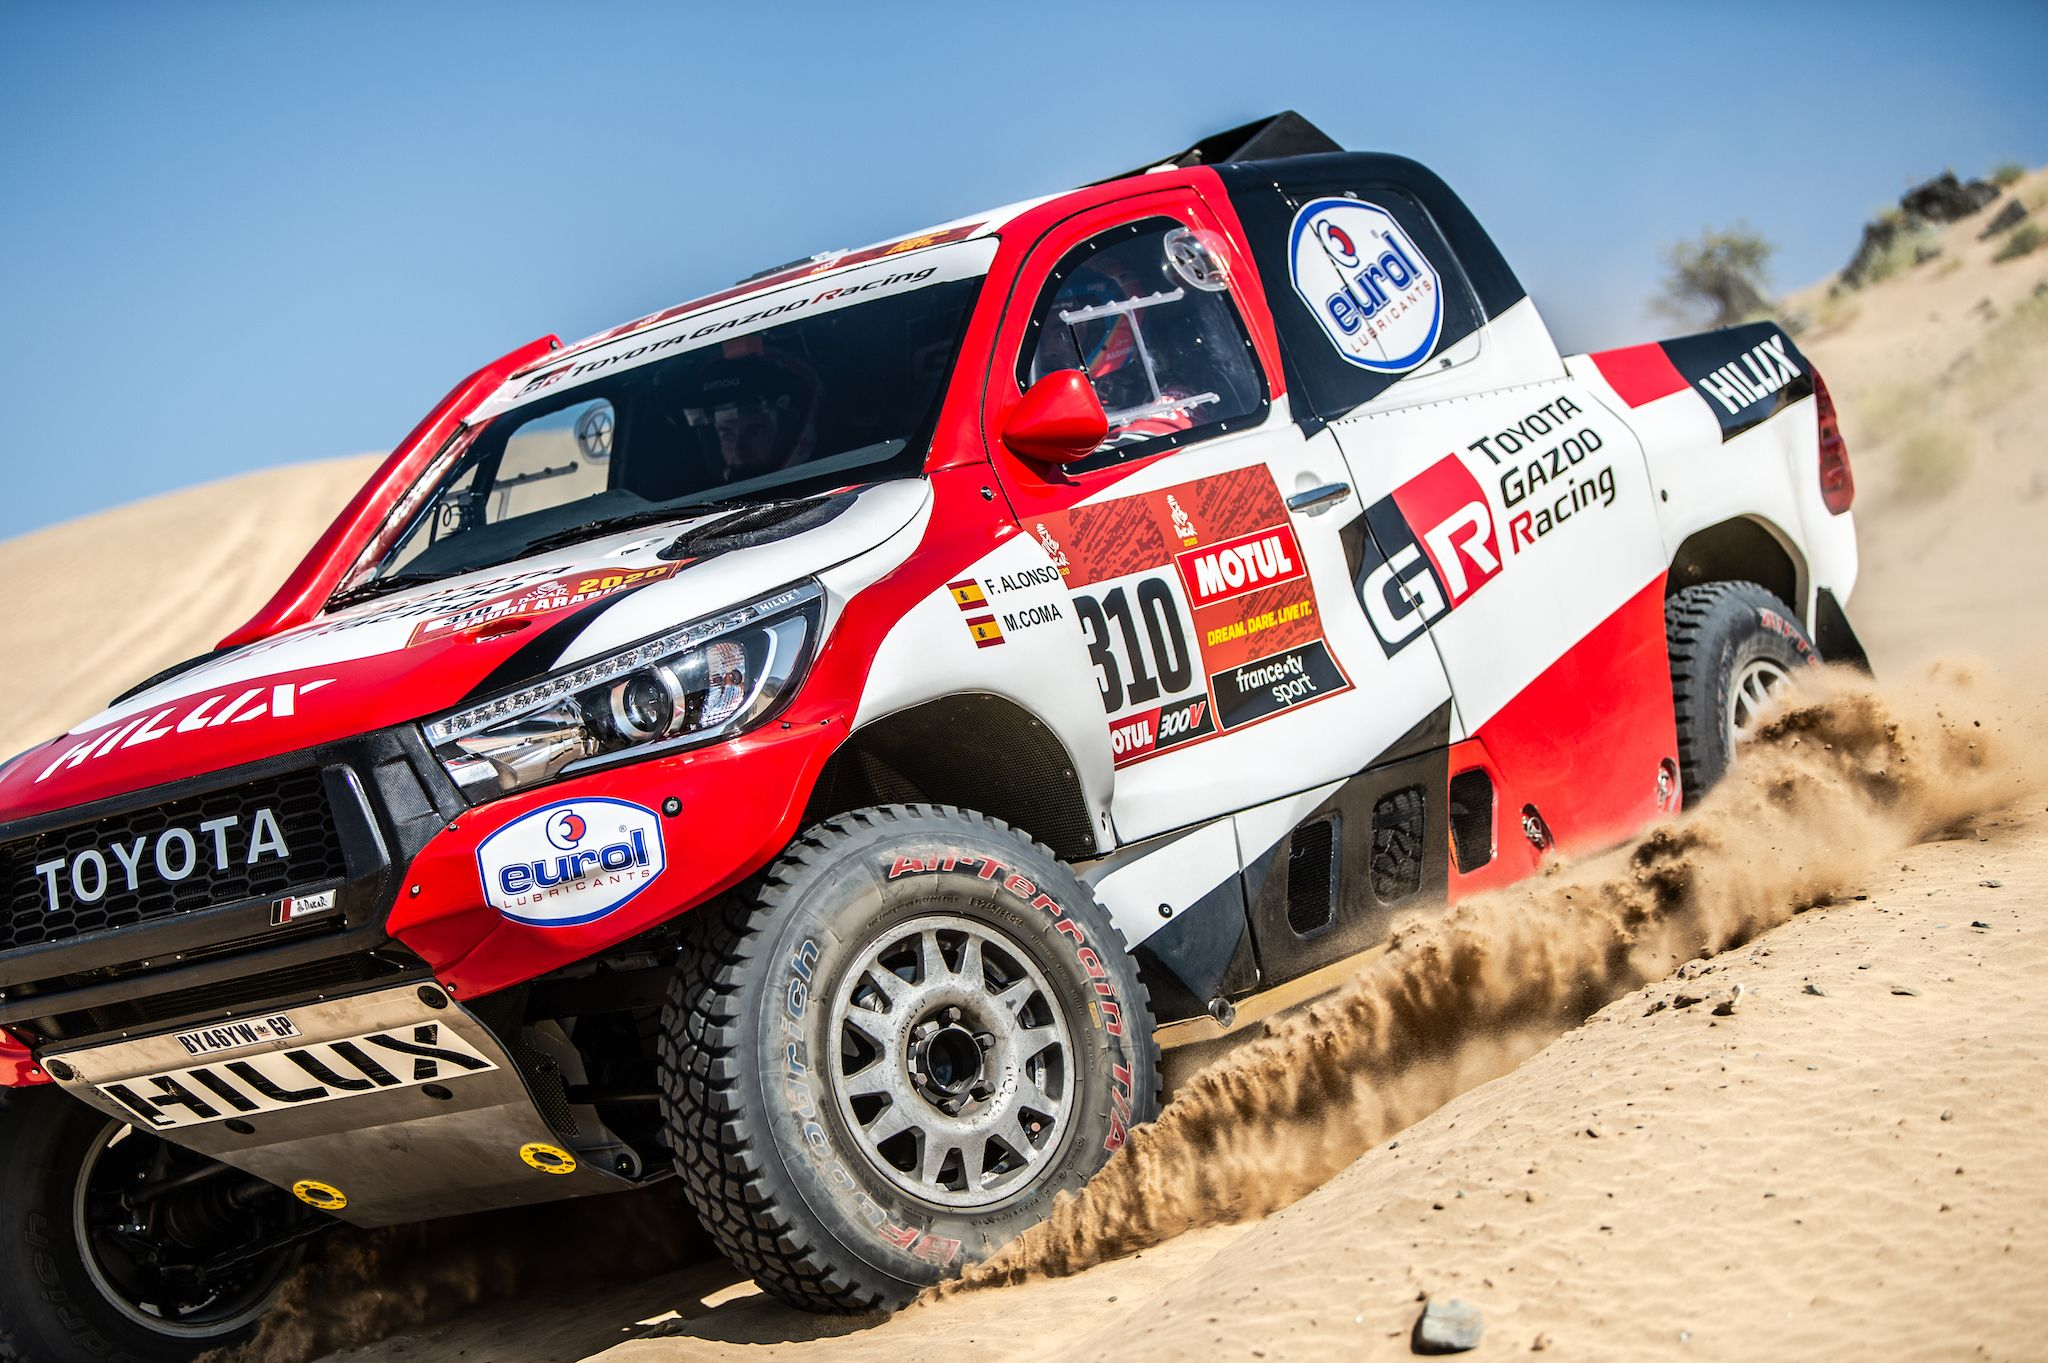 2020 Dakar Rally Https Newsroom Toyota Eu Asset 812468 M52 4457 In 2020 Dakar Toyota Toyota Hilux